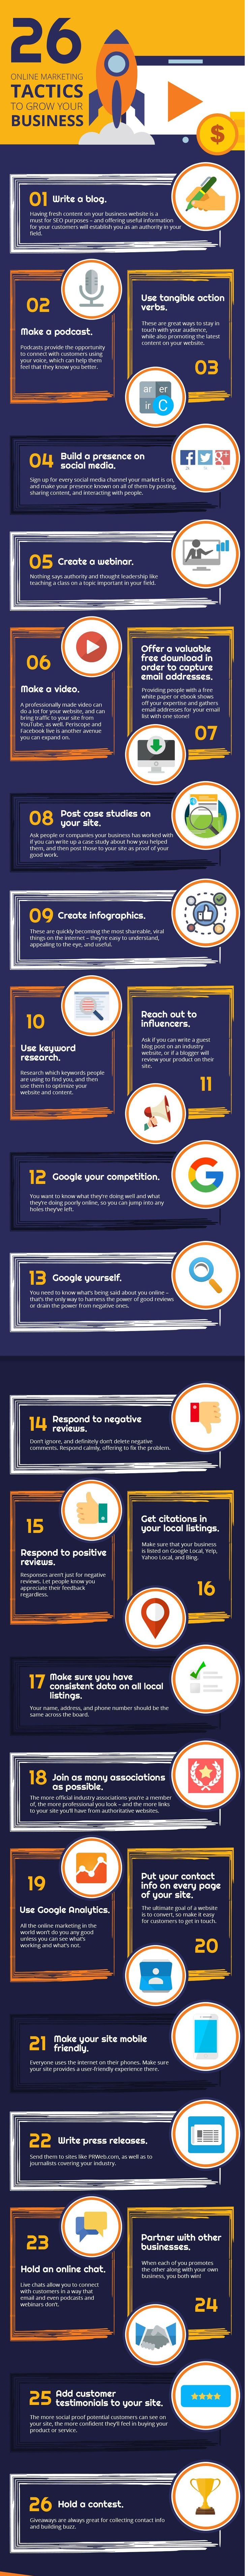 Advertising-Infographics-webdigital-seo-продвижение-web-website-сайт Advertising Infographics : #webdigital #seo #продвижение #web #website #сайт